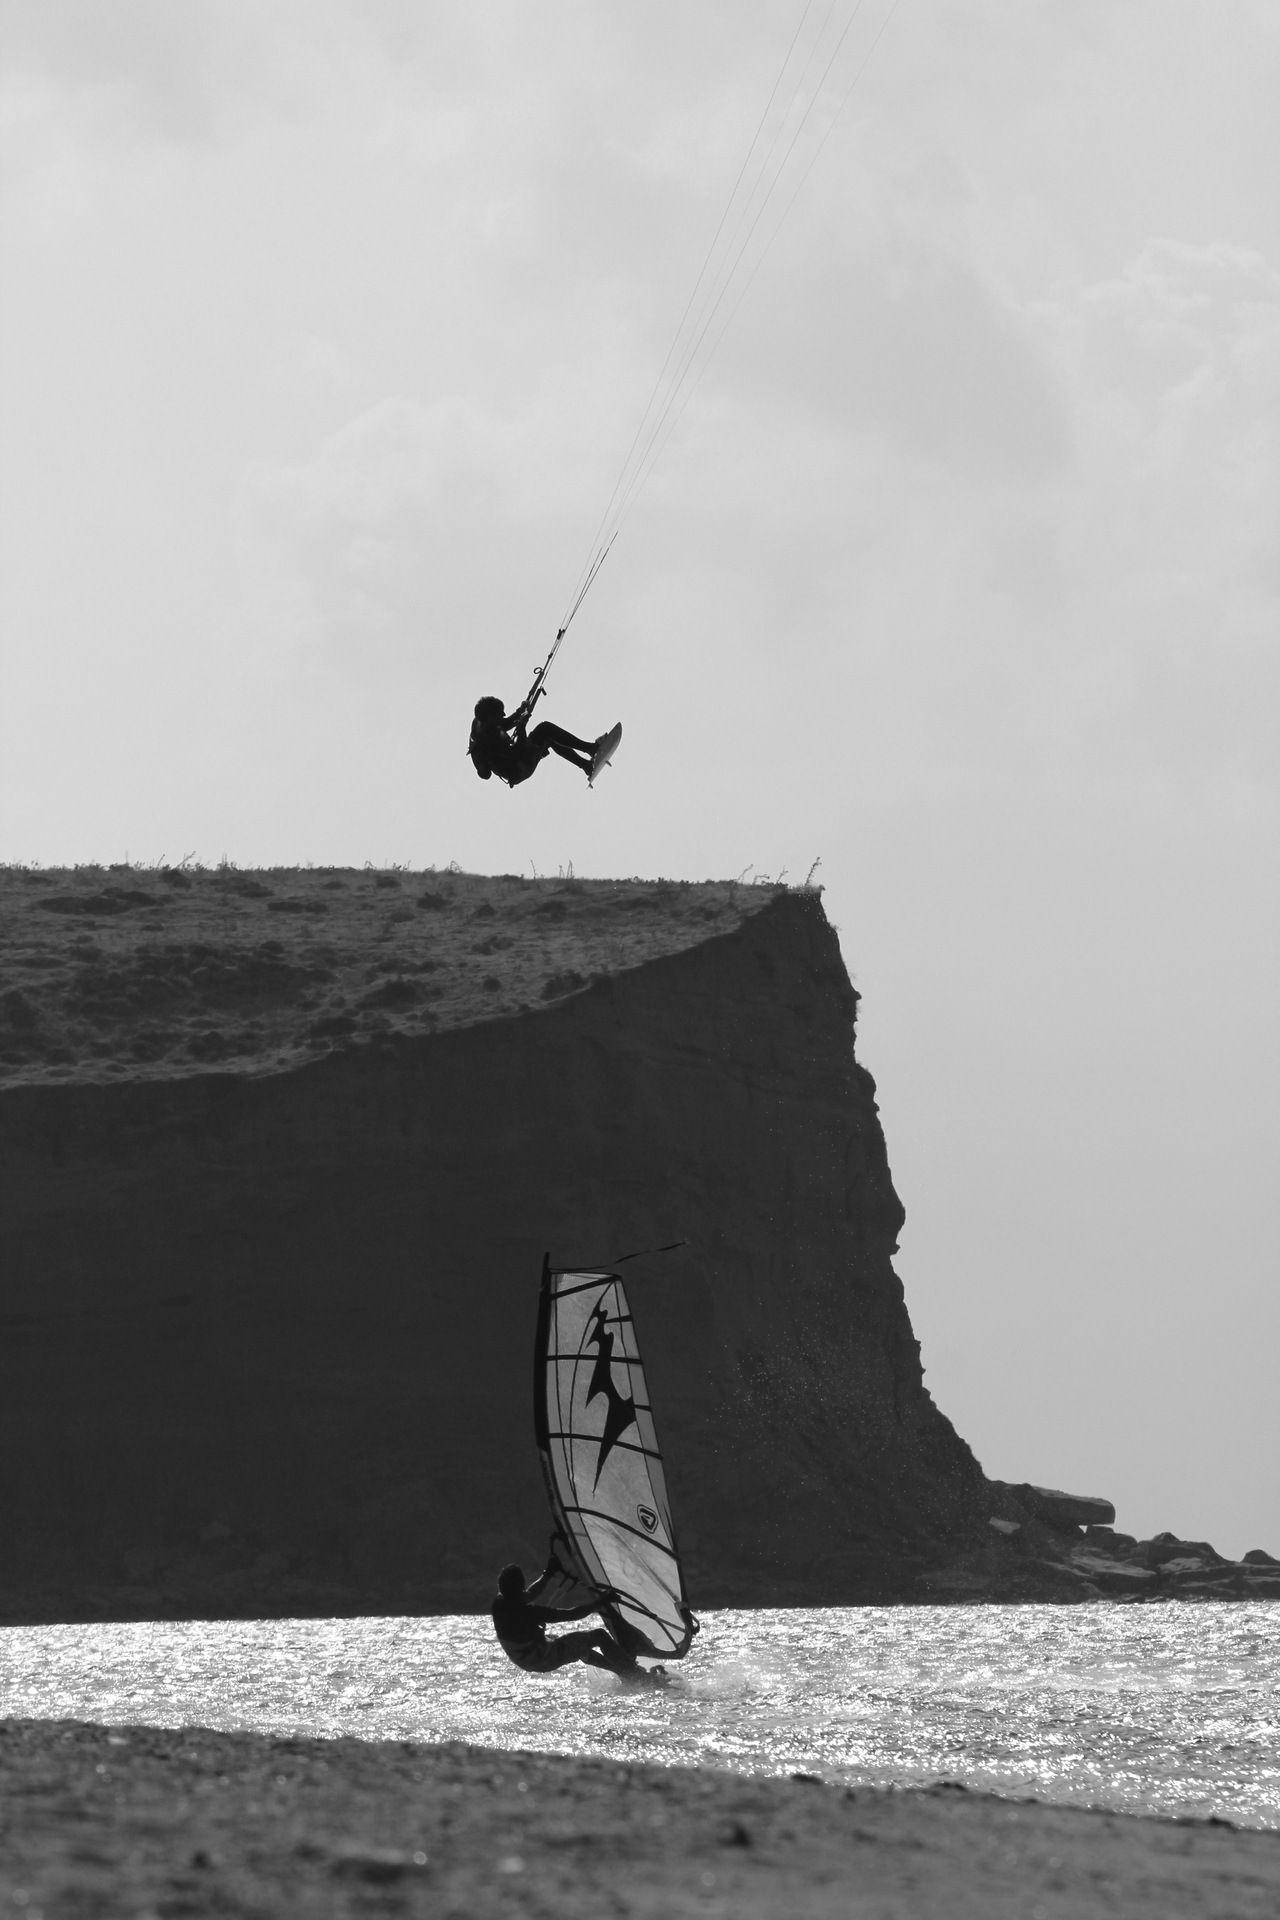 72dc5ffb575 Windsurfing  amp  Kite  sea  surf  kite  water  ocean  Rewave lab